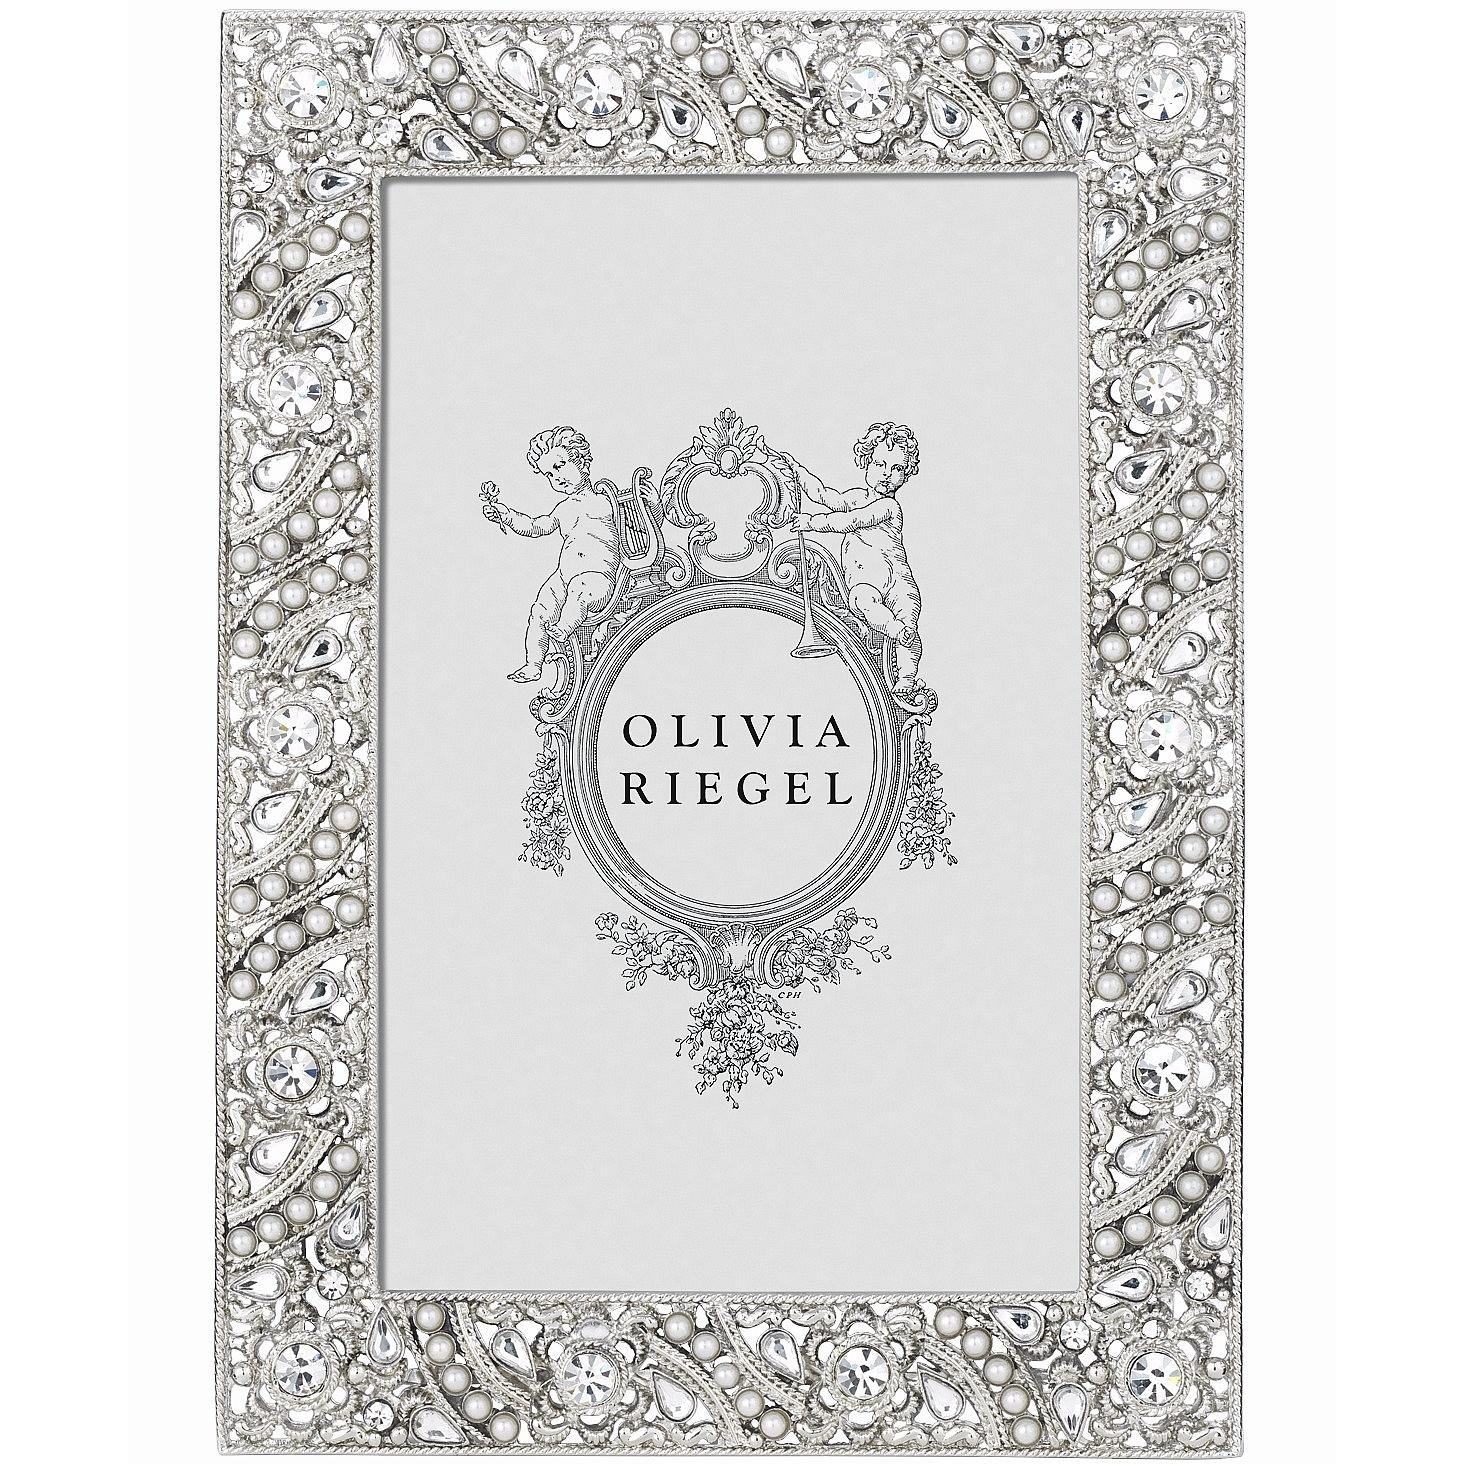 ELOISE Austrian Perle /& Crystal 4x6 frame by Olivia Riegel 4x6 RT1984